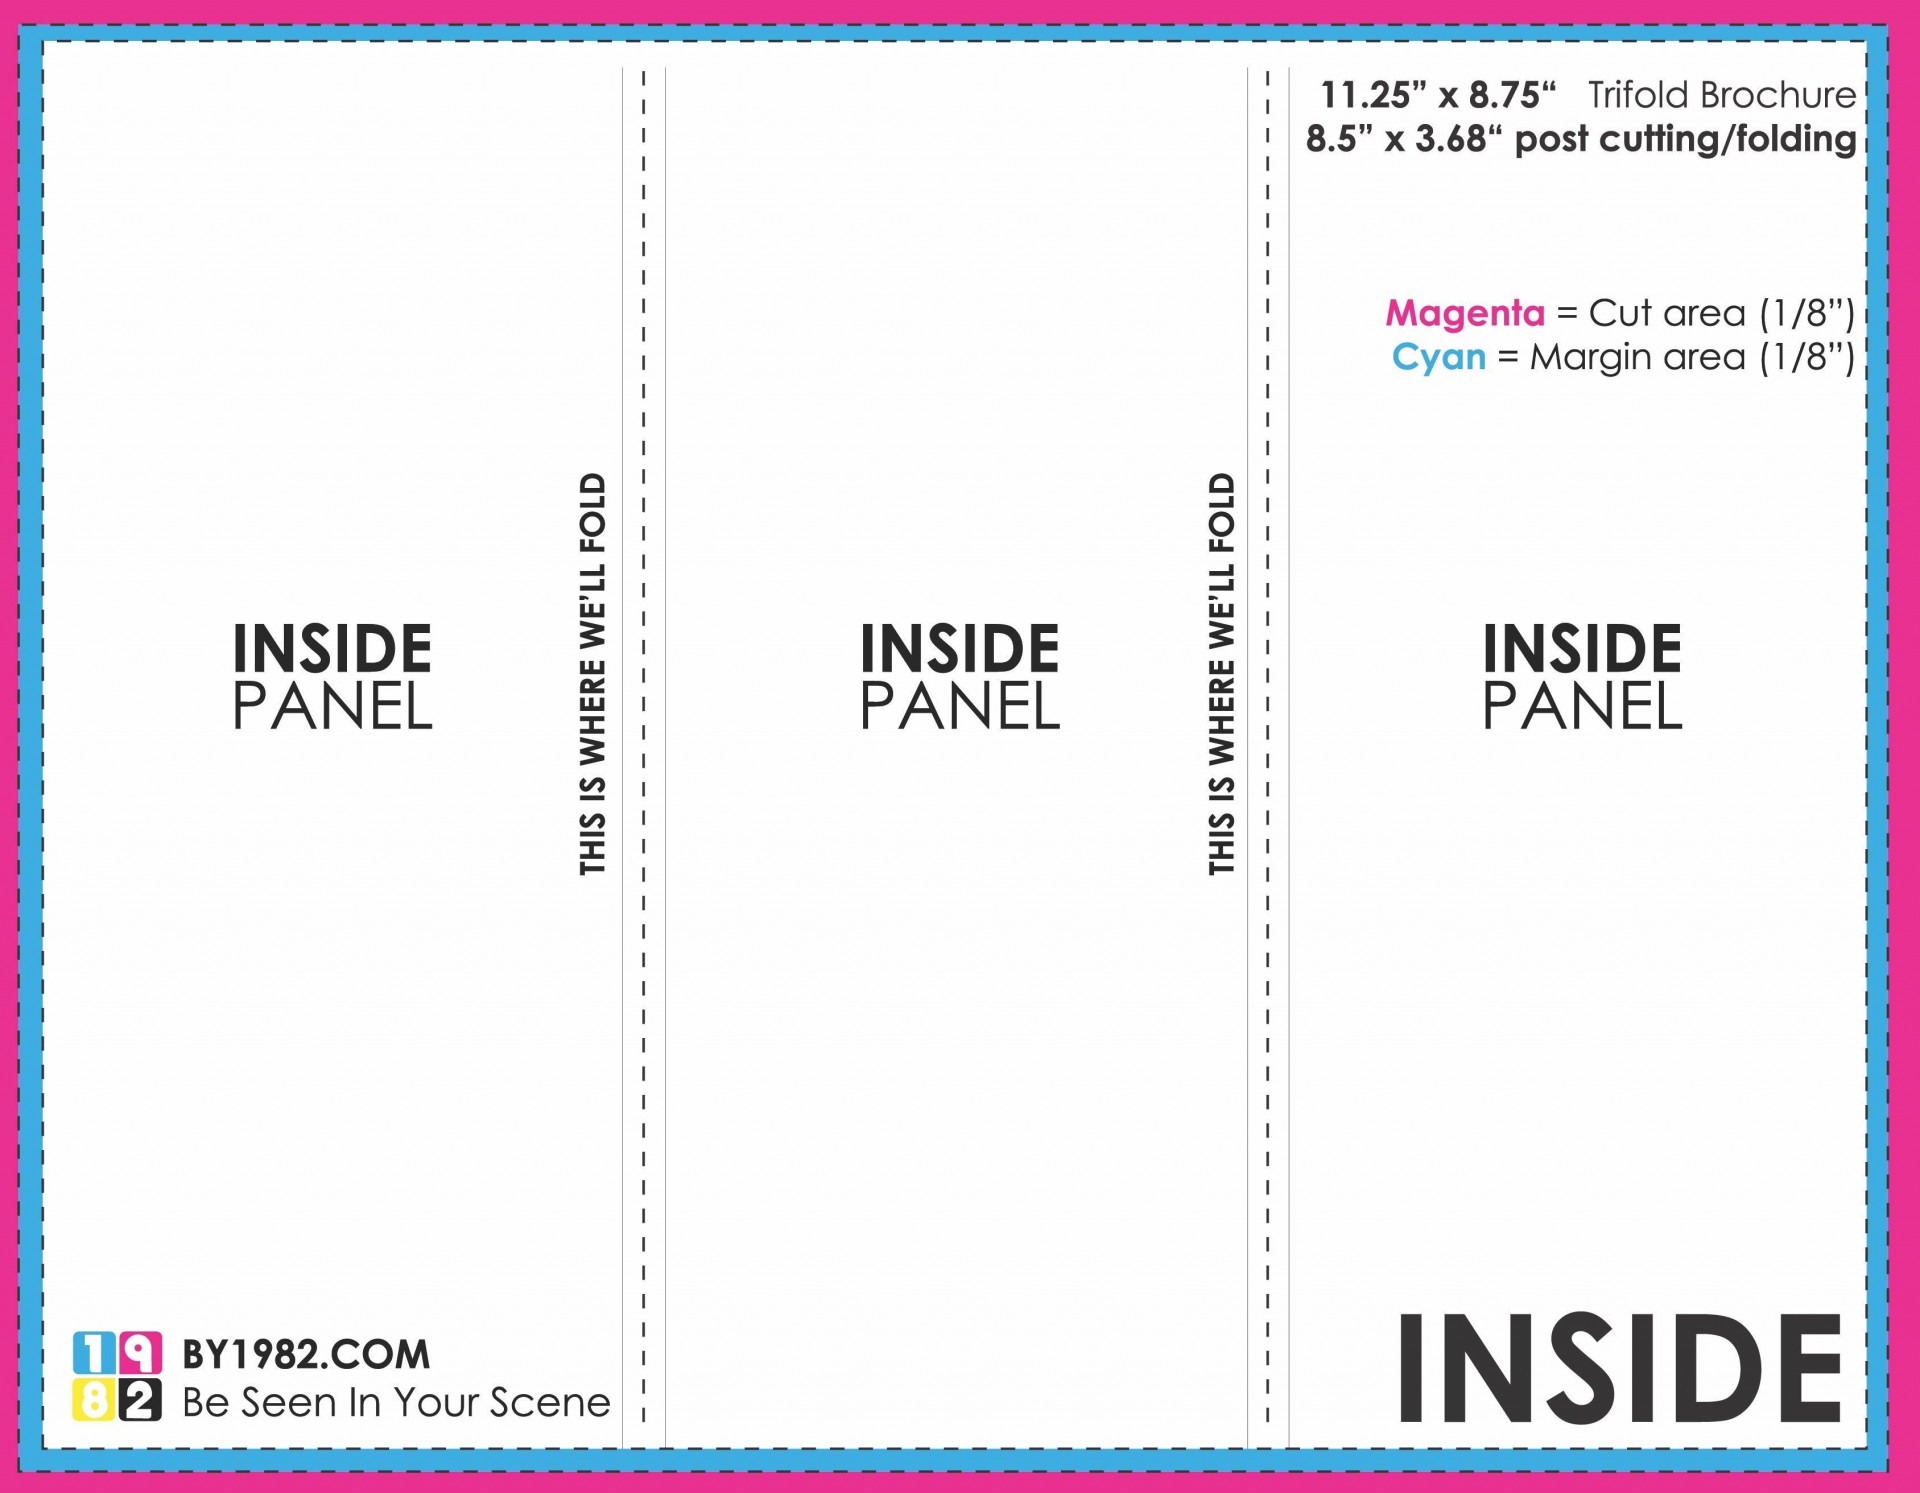 005 Wondrou Brochure Template For Google Doc Sample  Docs Free 3 Panel Tri Fold1920